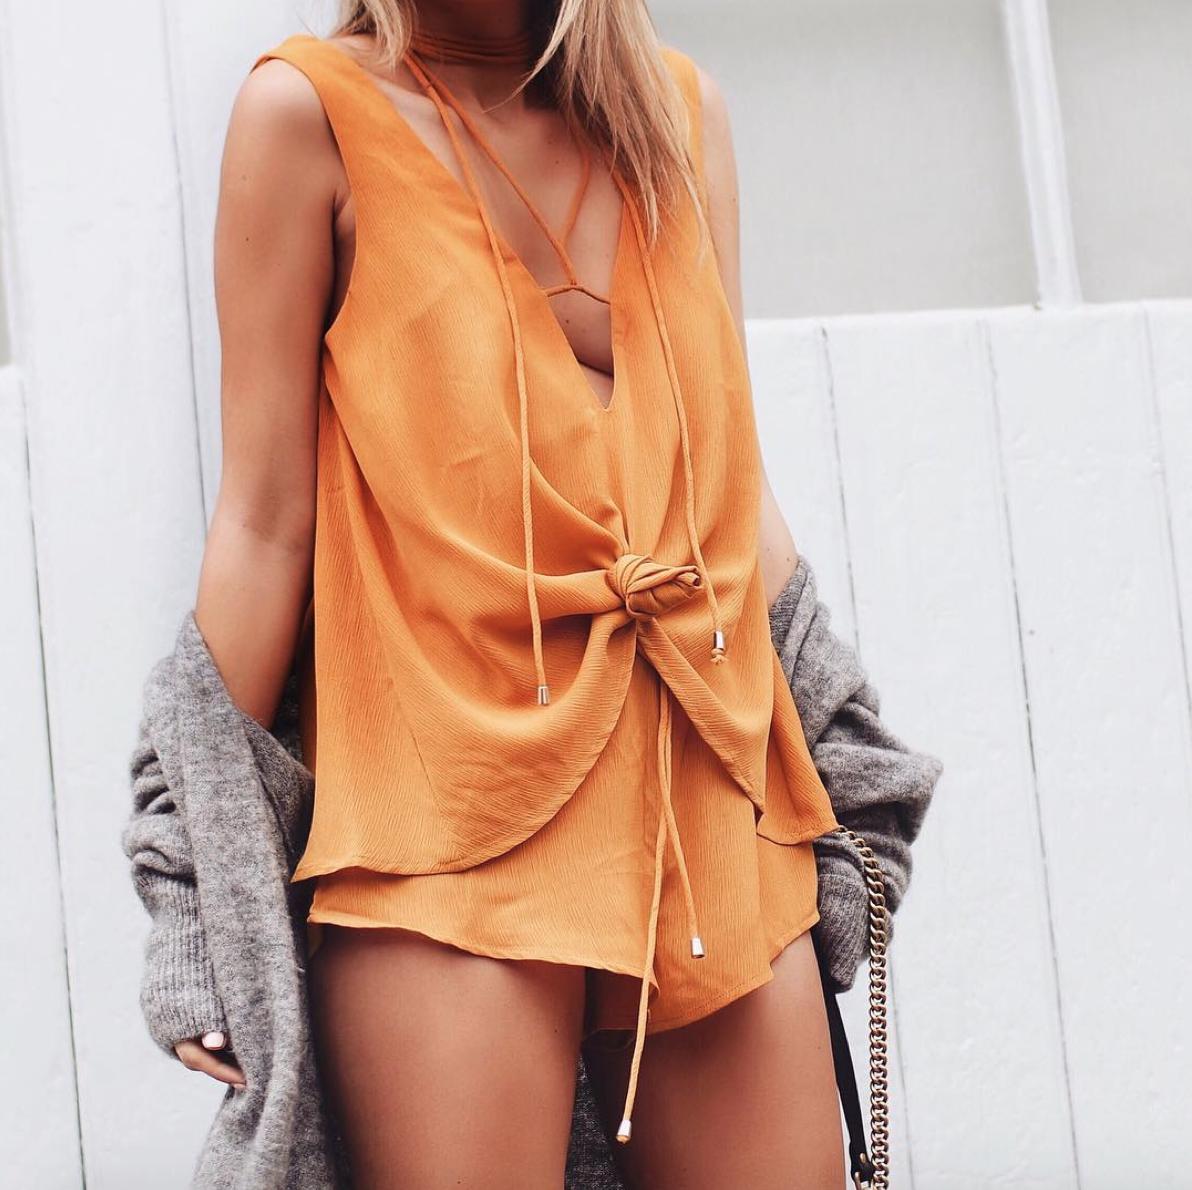 Sabo Skirt Everly Mustard Playsuit